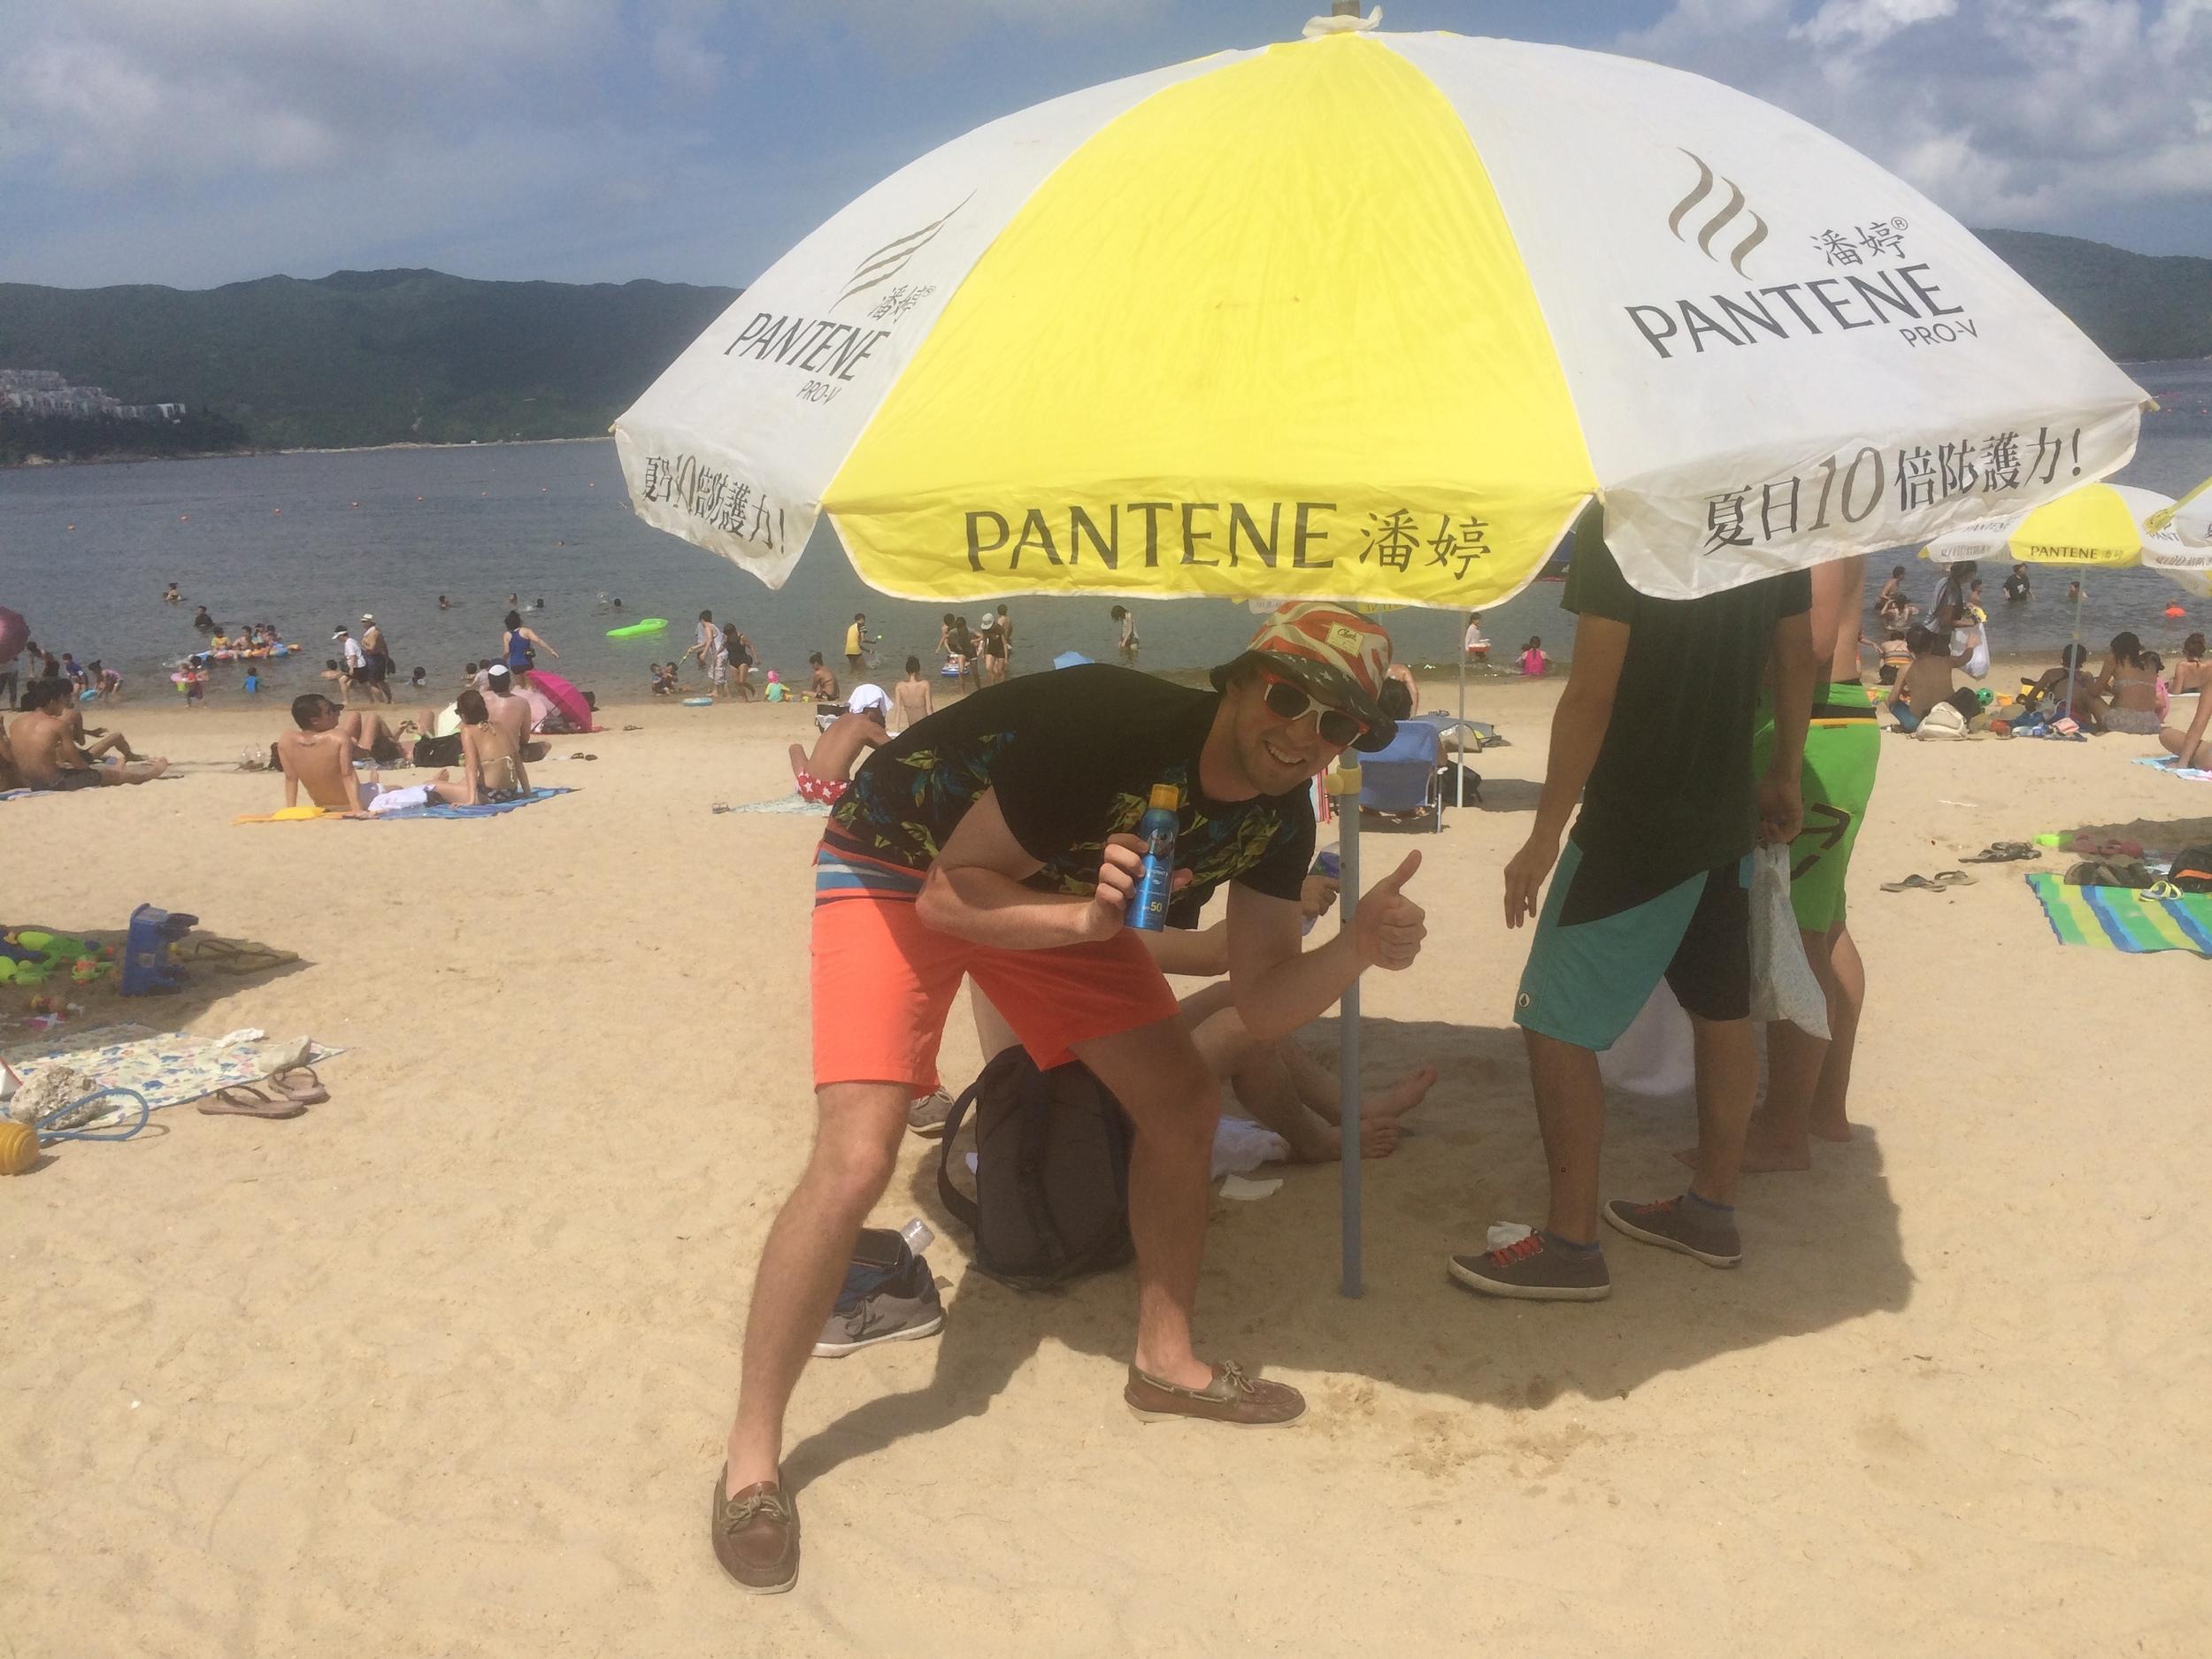 The Dins in full tourist attire on Stanley's beach